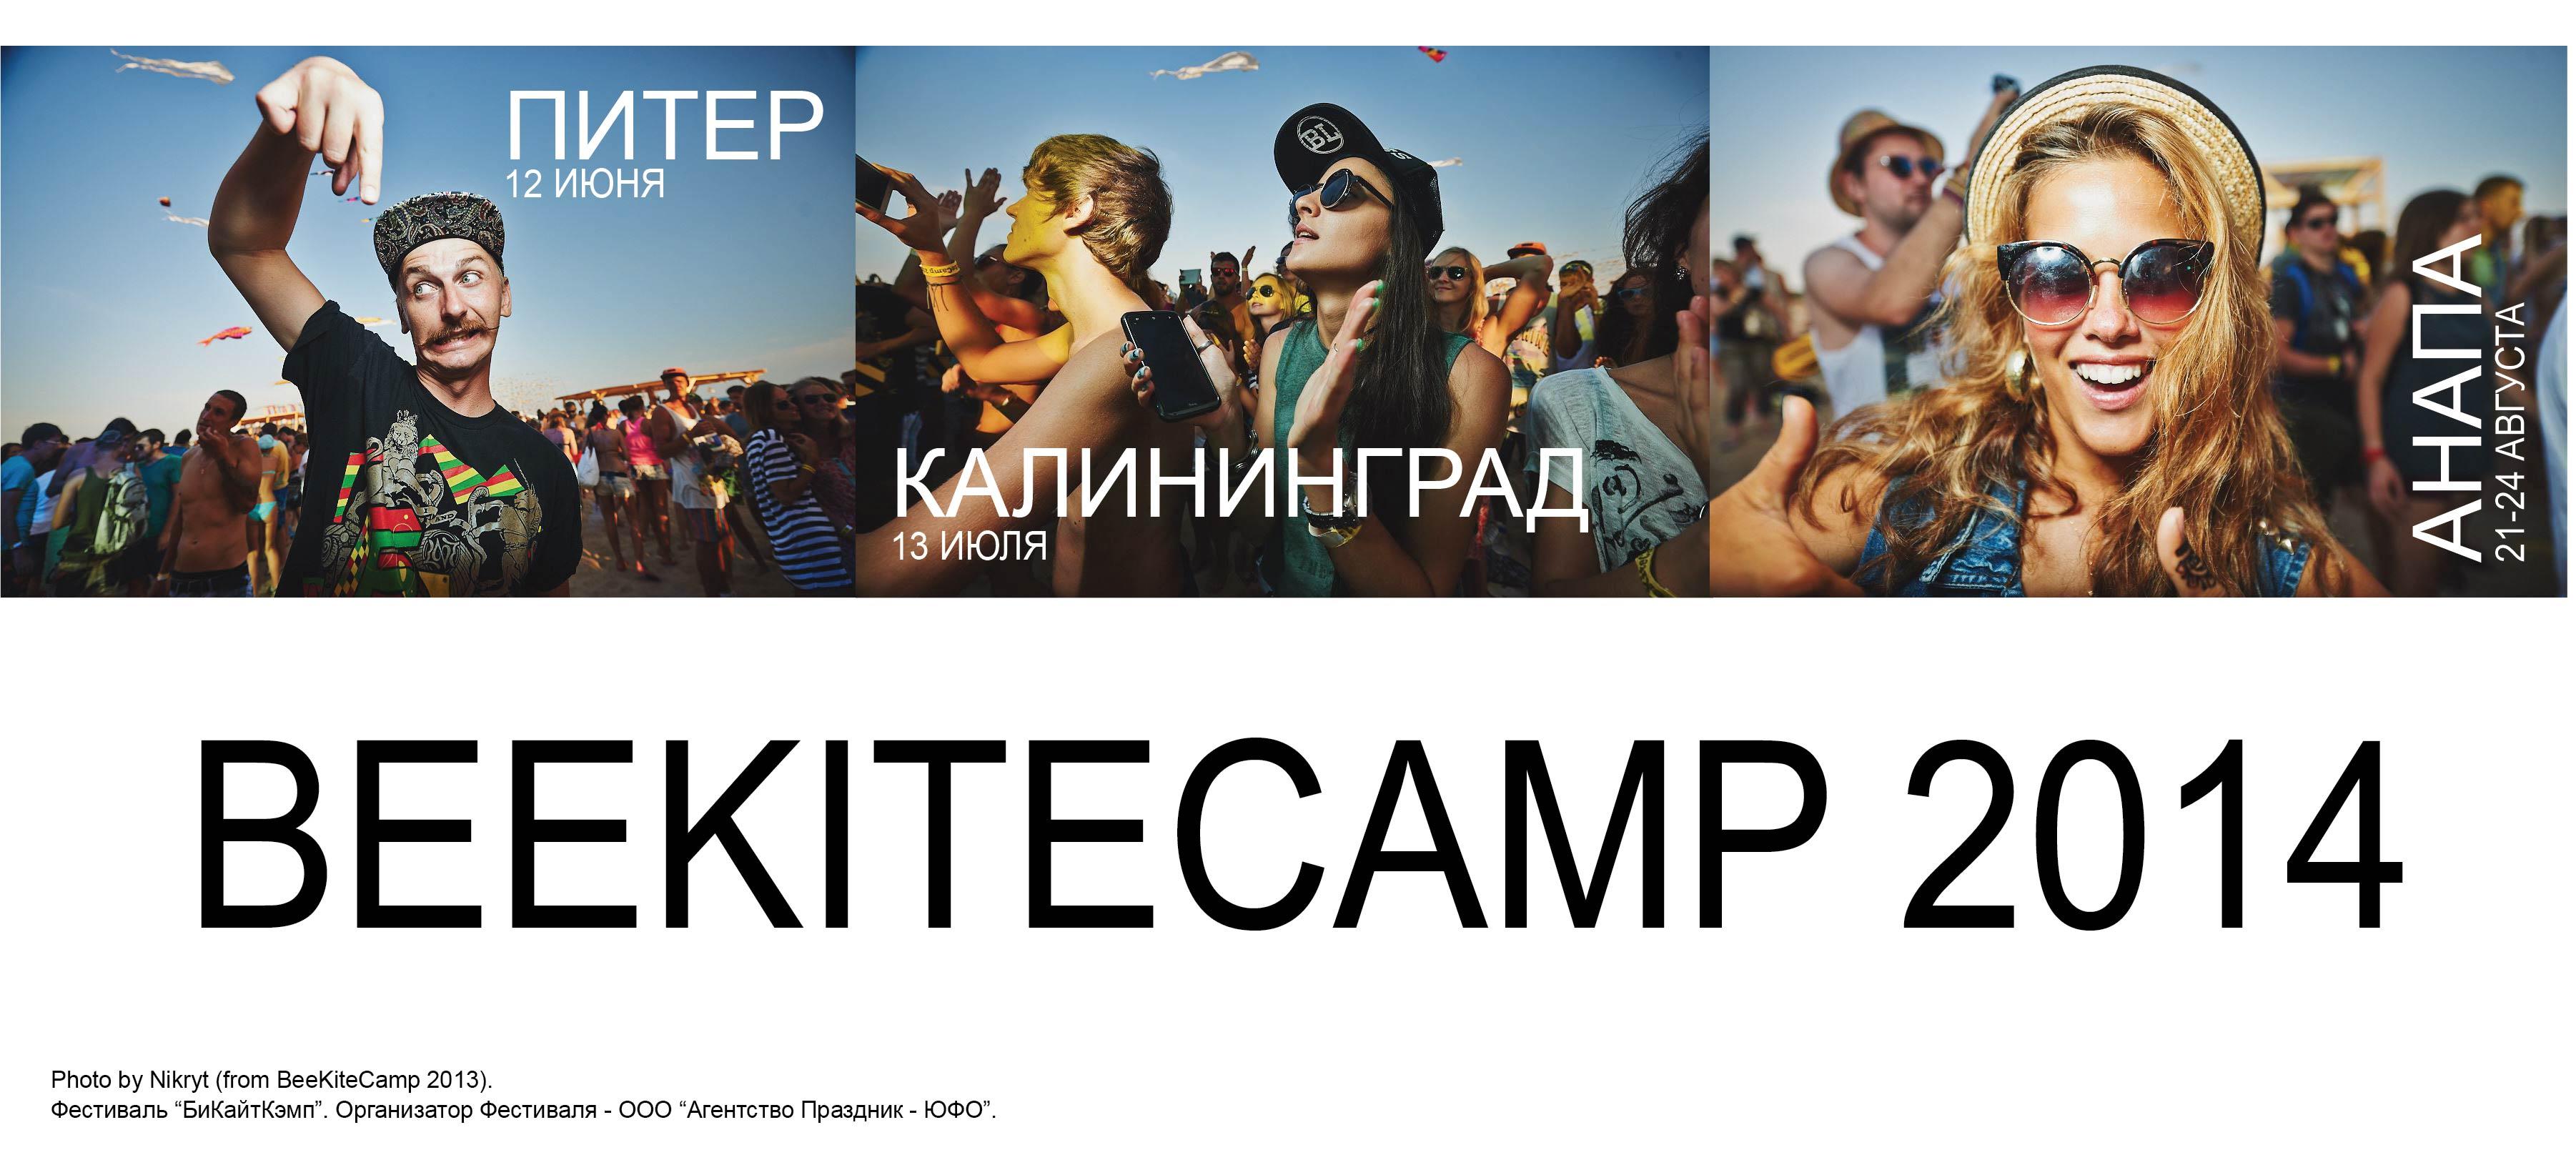 Фестиваль Музыки&Спорта